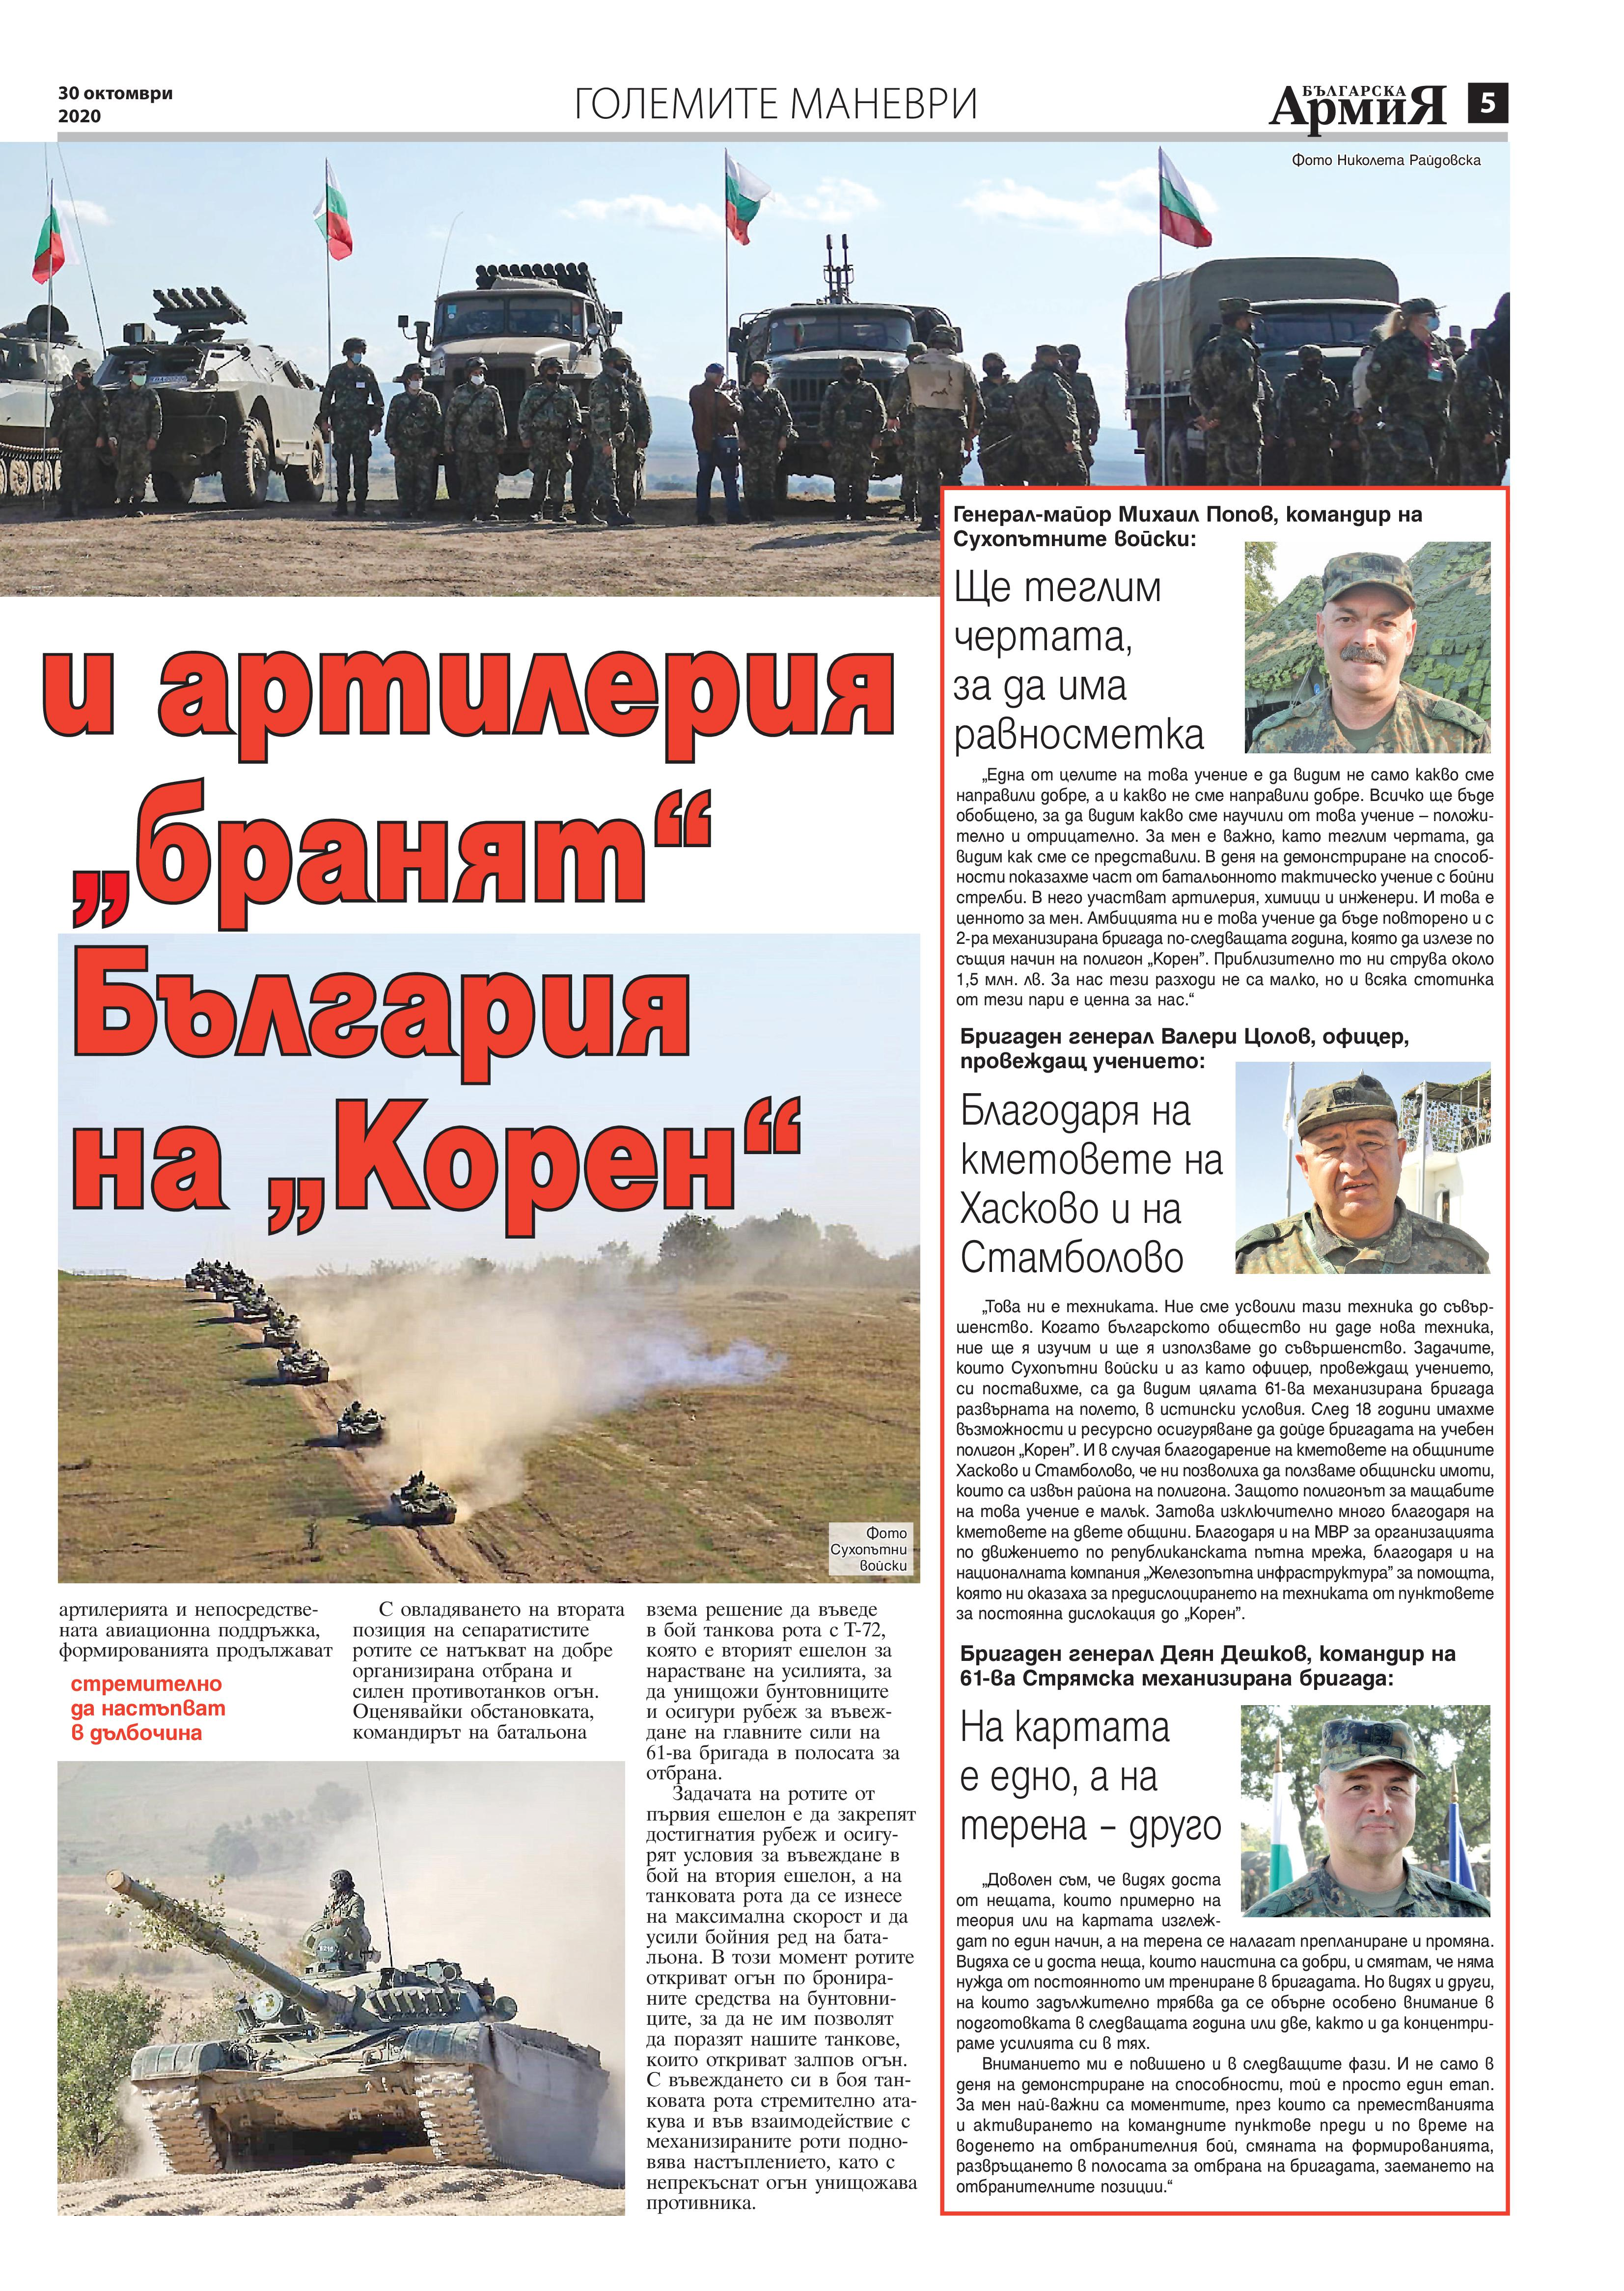 https://www.armymedia.bg/wp-content/uploads/2015/06/05-45.jpg